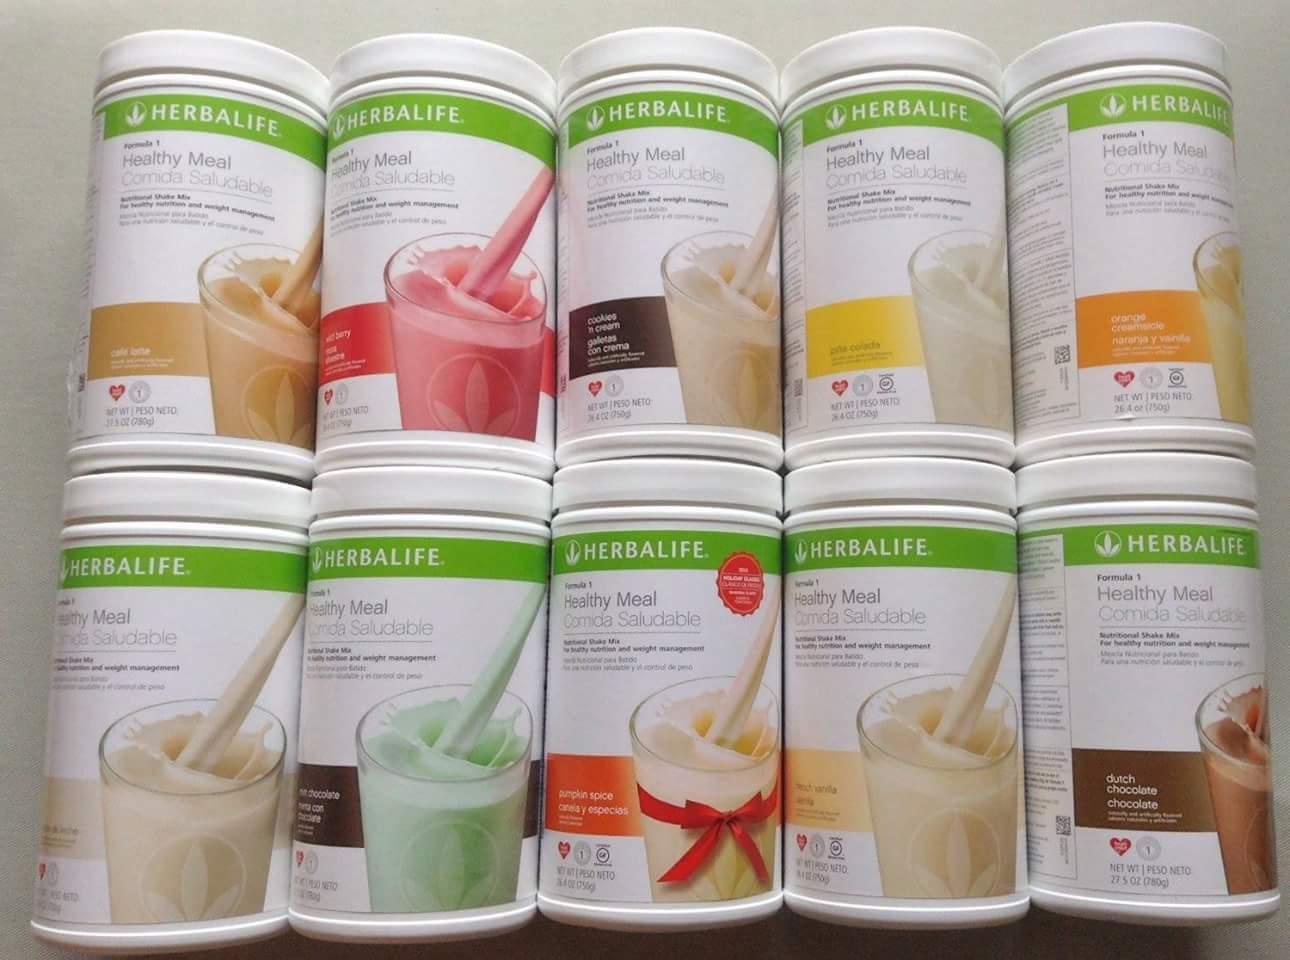 Изображение товара NEW Herbalife Formula 1 Healthy Meal Nutritional Shake Mix ( 10 Flavors)